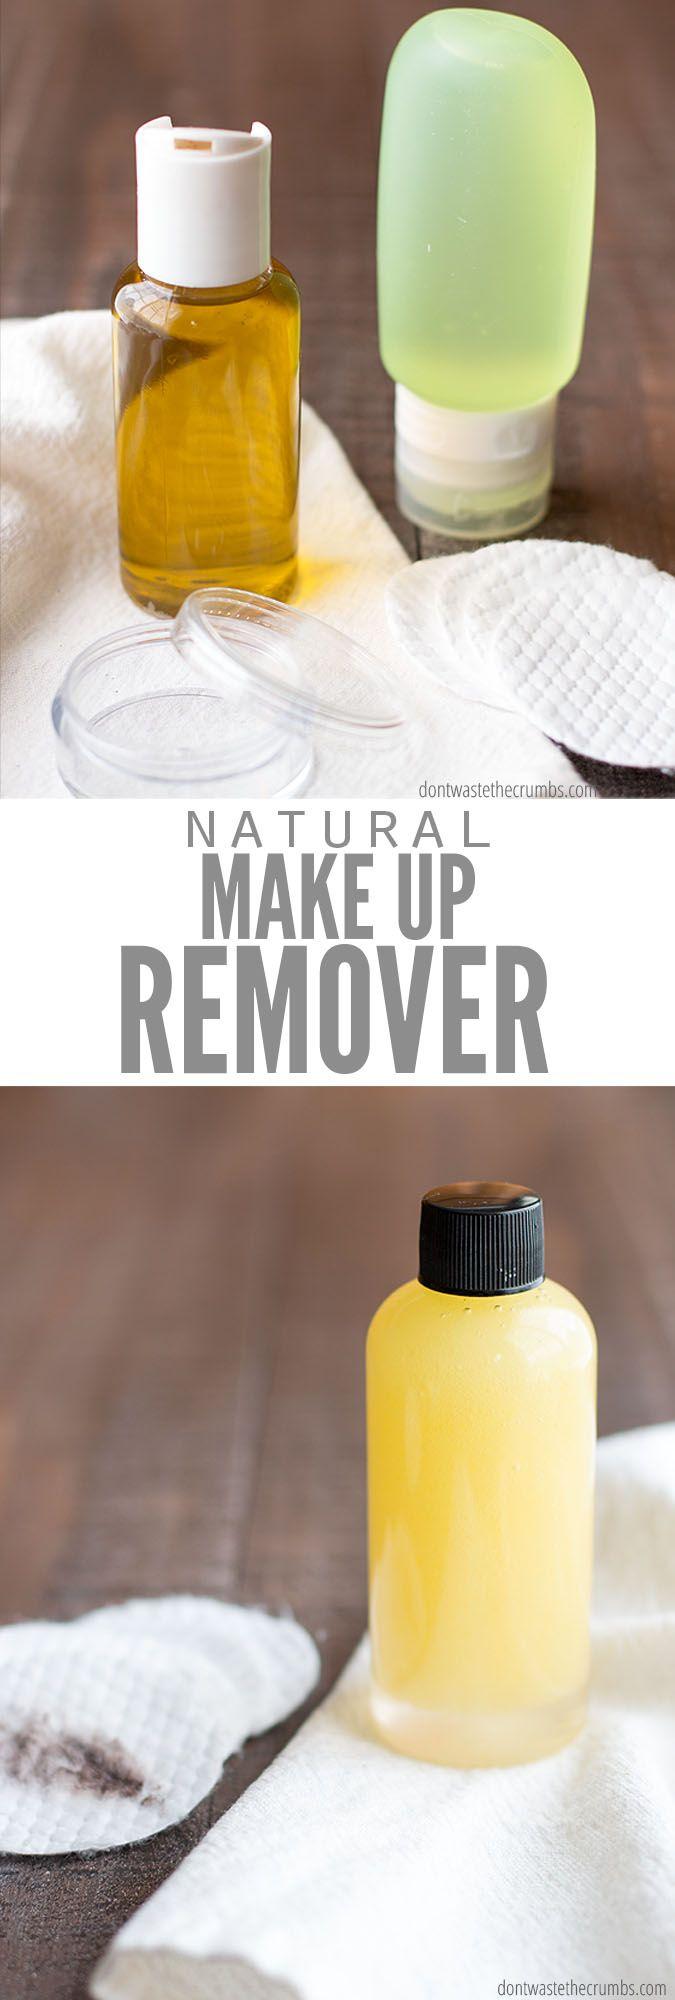 Natural Makeup Remover Natural Makeup Remover Diy Makeup diy makeup remover